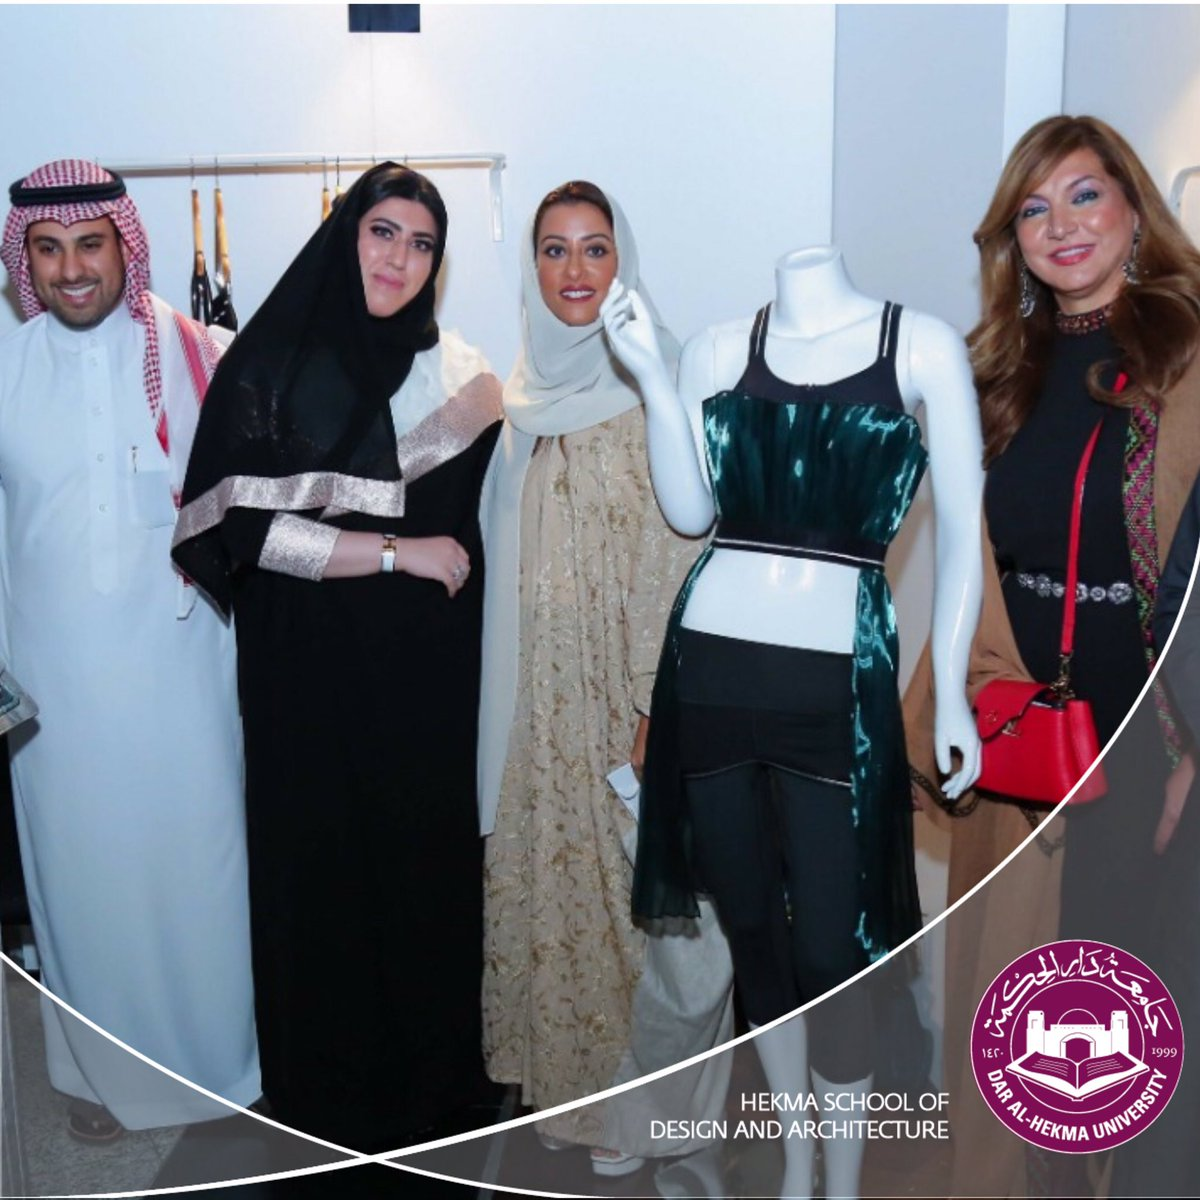 جامعة دار الحكمة On Twitter The Fashion Dept At Dar Alhekma With Lexus Under The Patronage Of H H Princess Noura Bint Faisal Al Saud The Fashion Design Dept Chaired By Dr Sana Abbasi Abdulateef Jameel